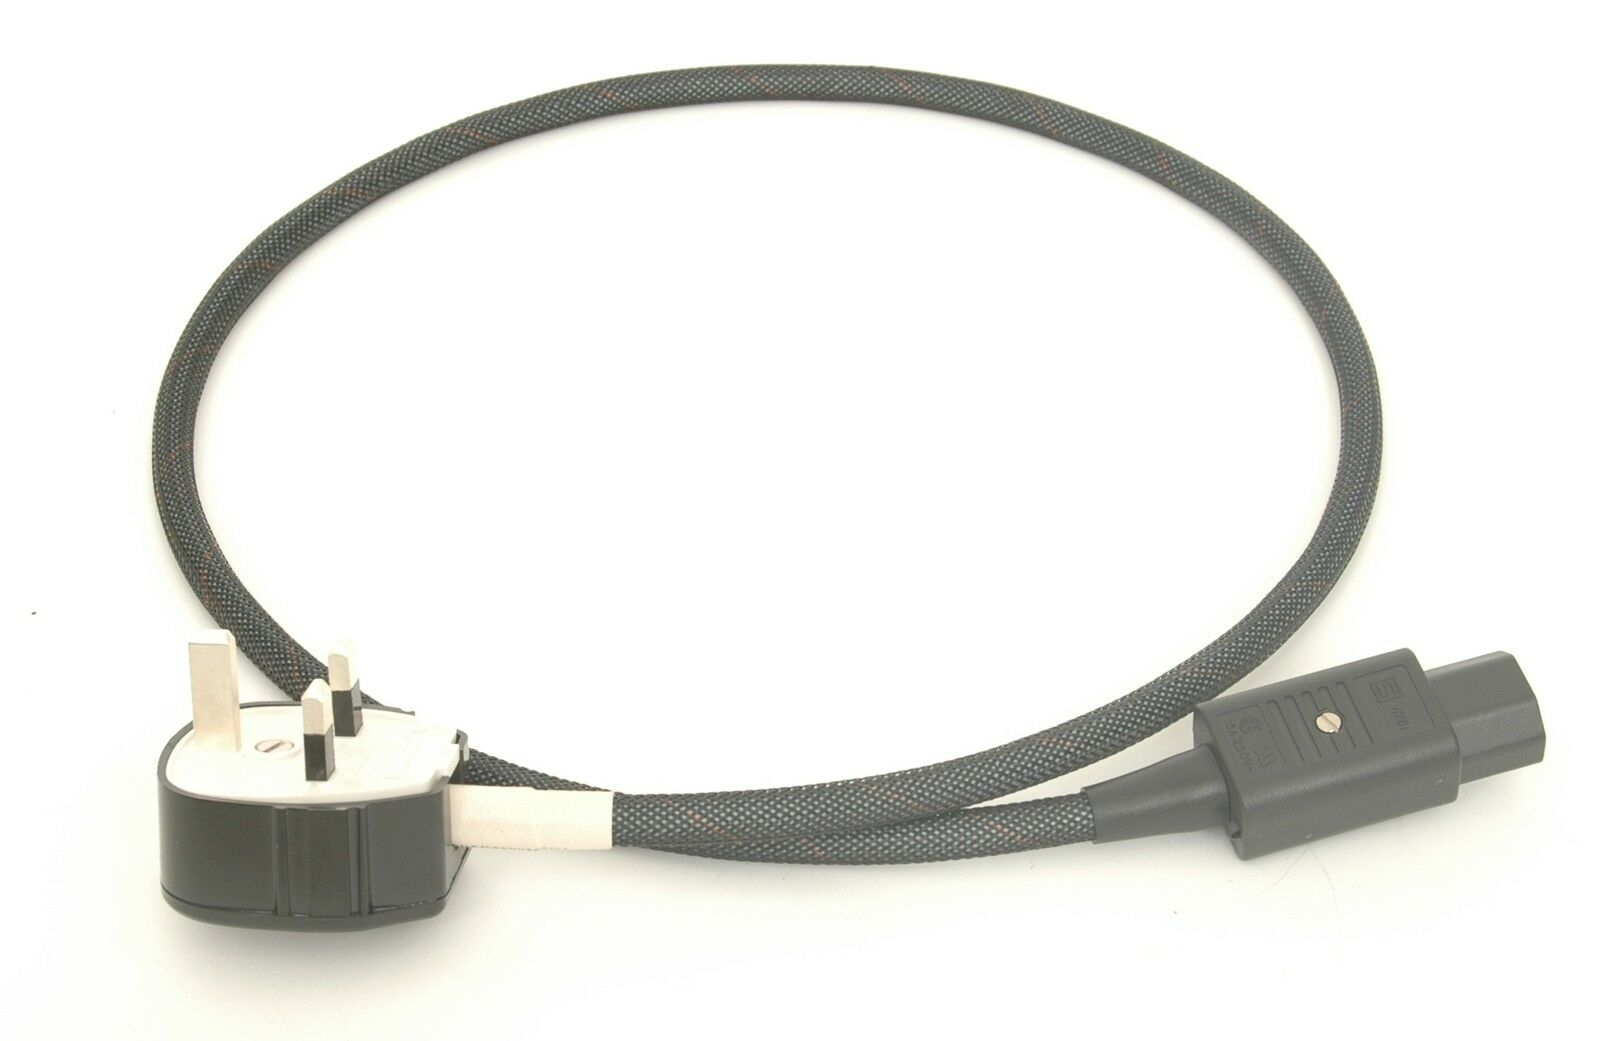 Mains cable 1.5m RFI shielded dual screen MK silver plug & silver IEC